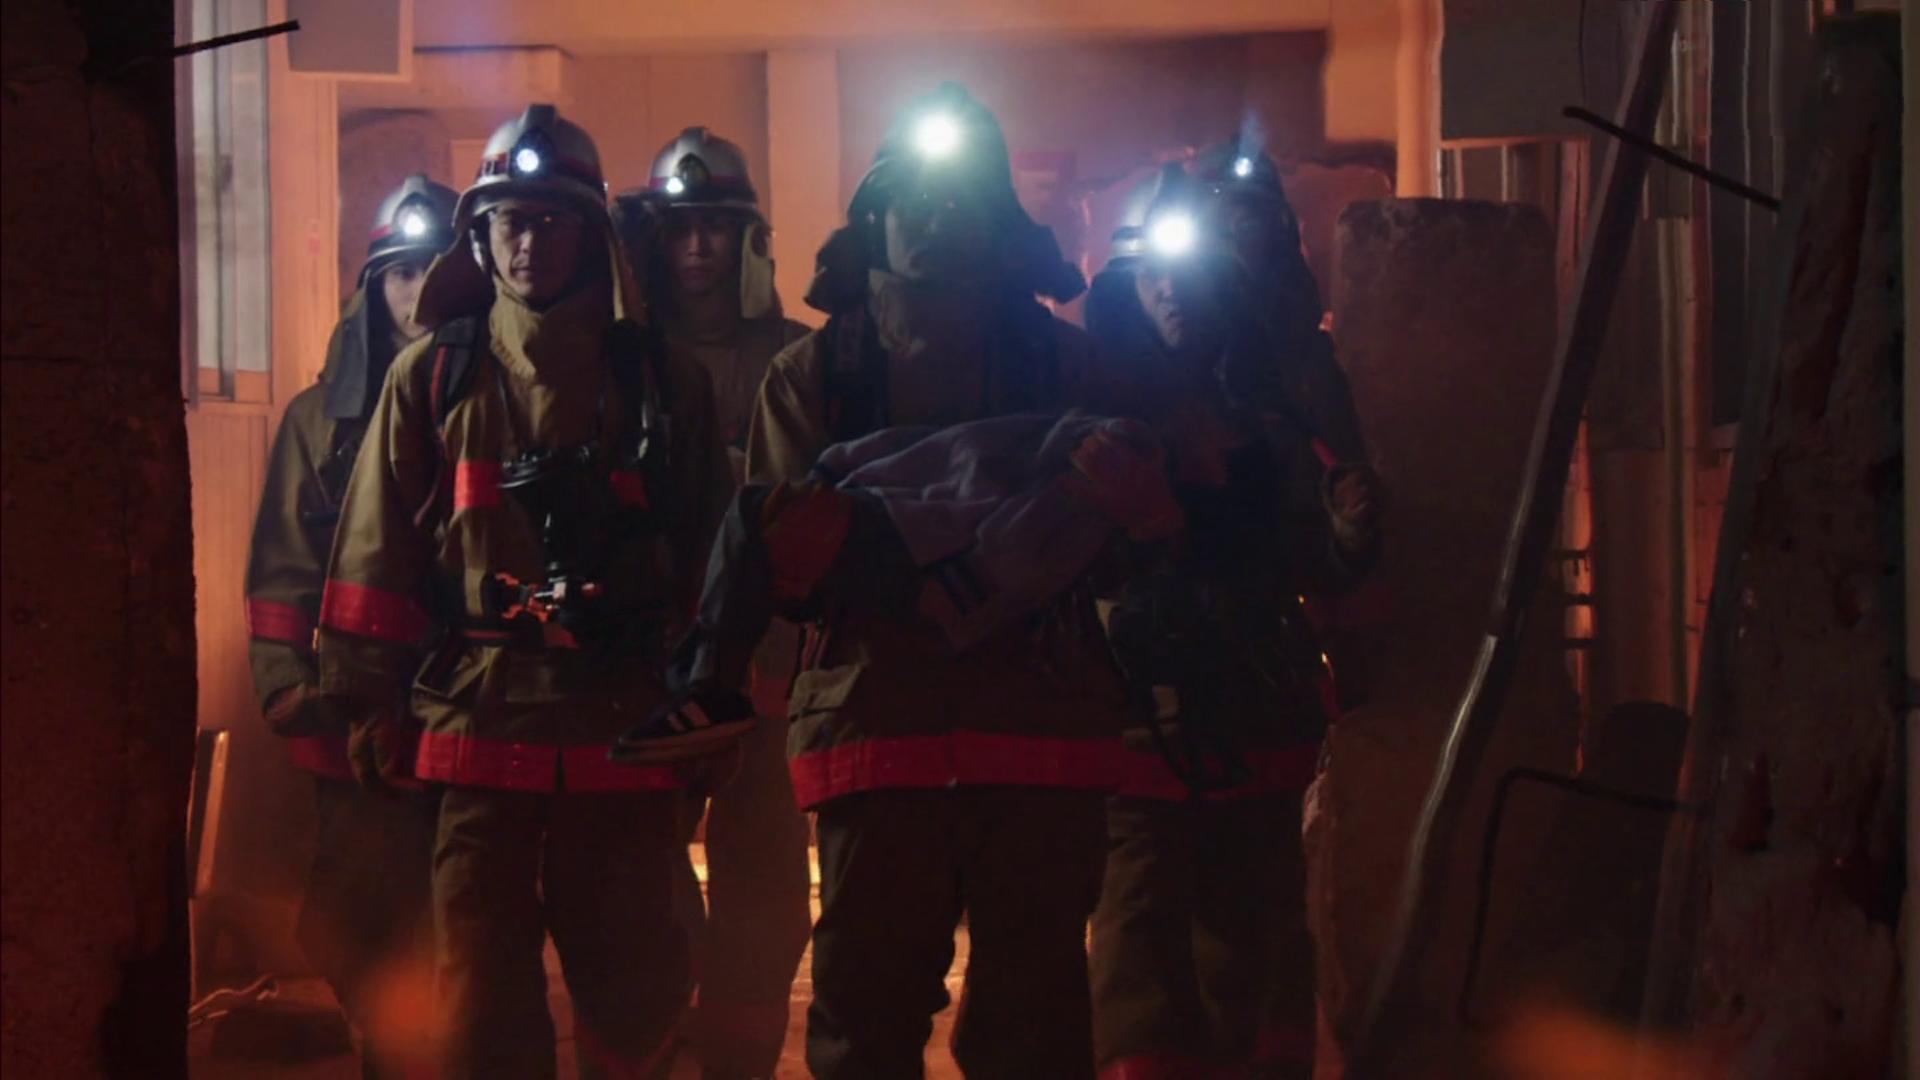 Firefighters Battling the Blaze